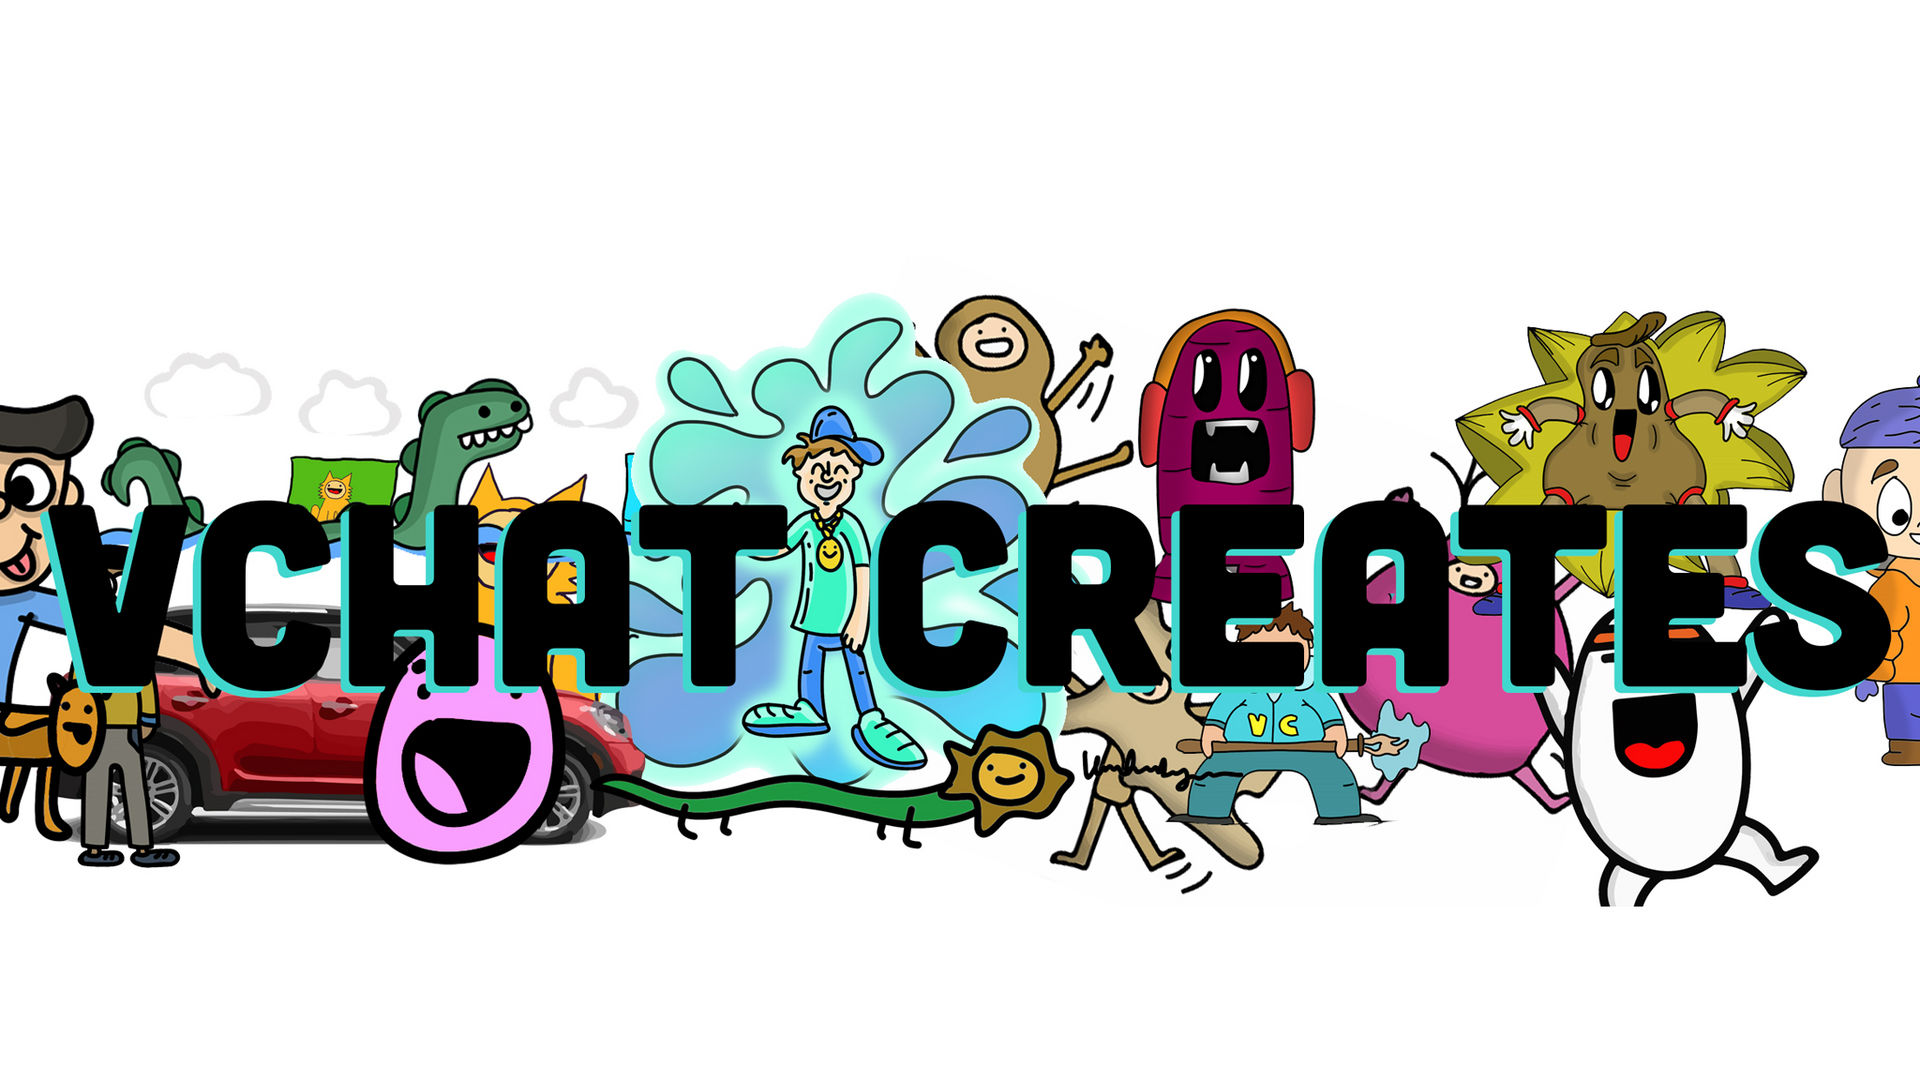 VCHAT CREATES